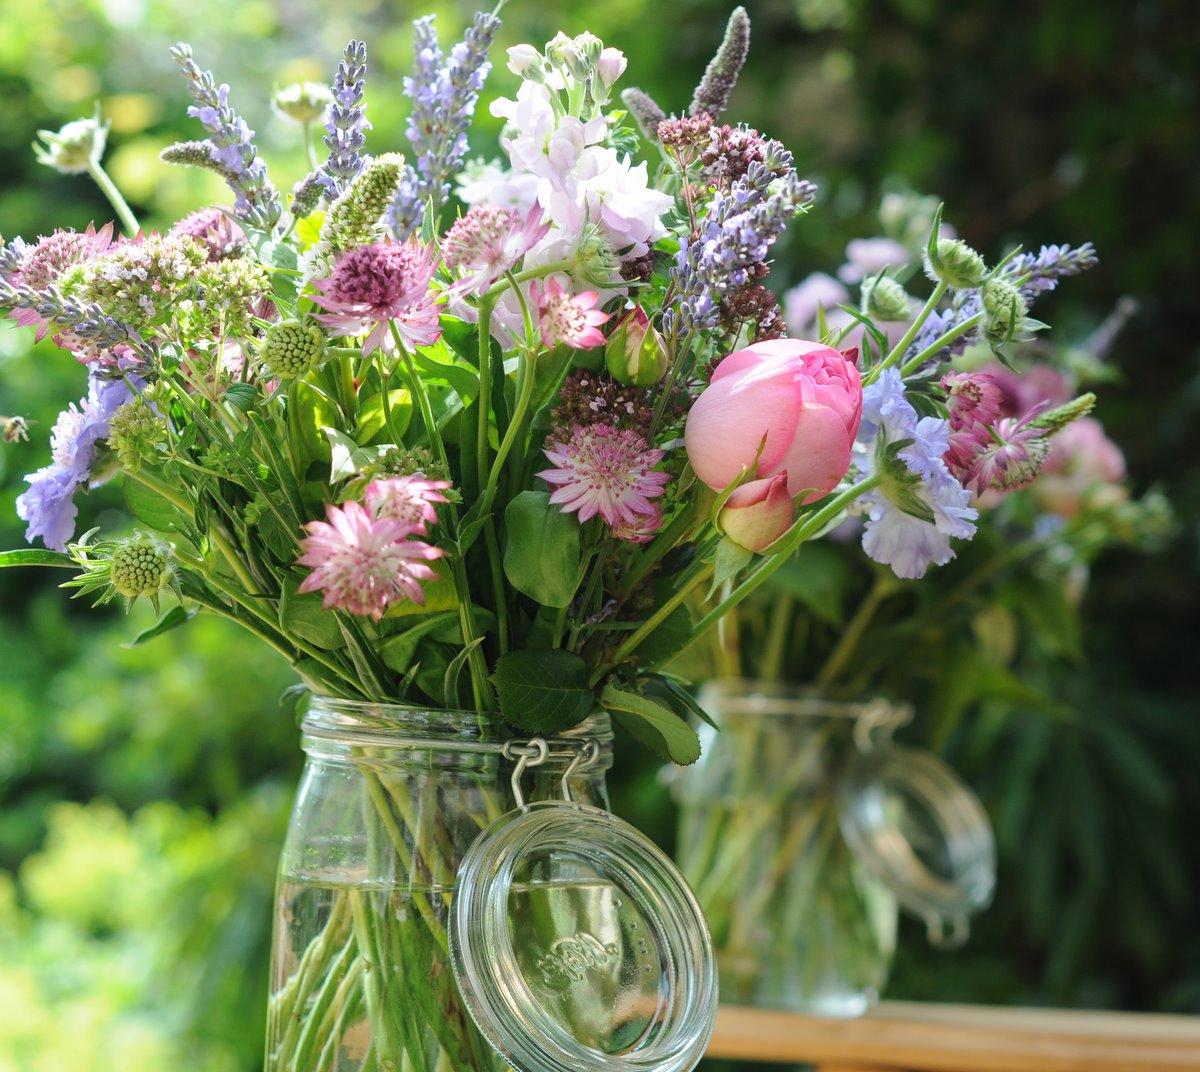 Summer Wedding Flowers: Spriggs Florist: Kilner Jars & English Summer Flowers